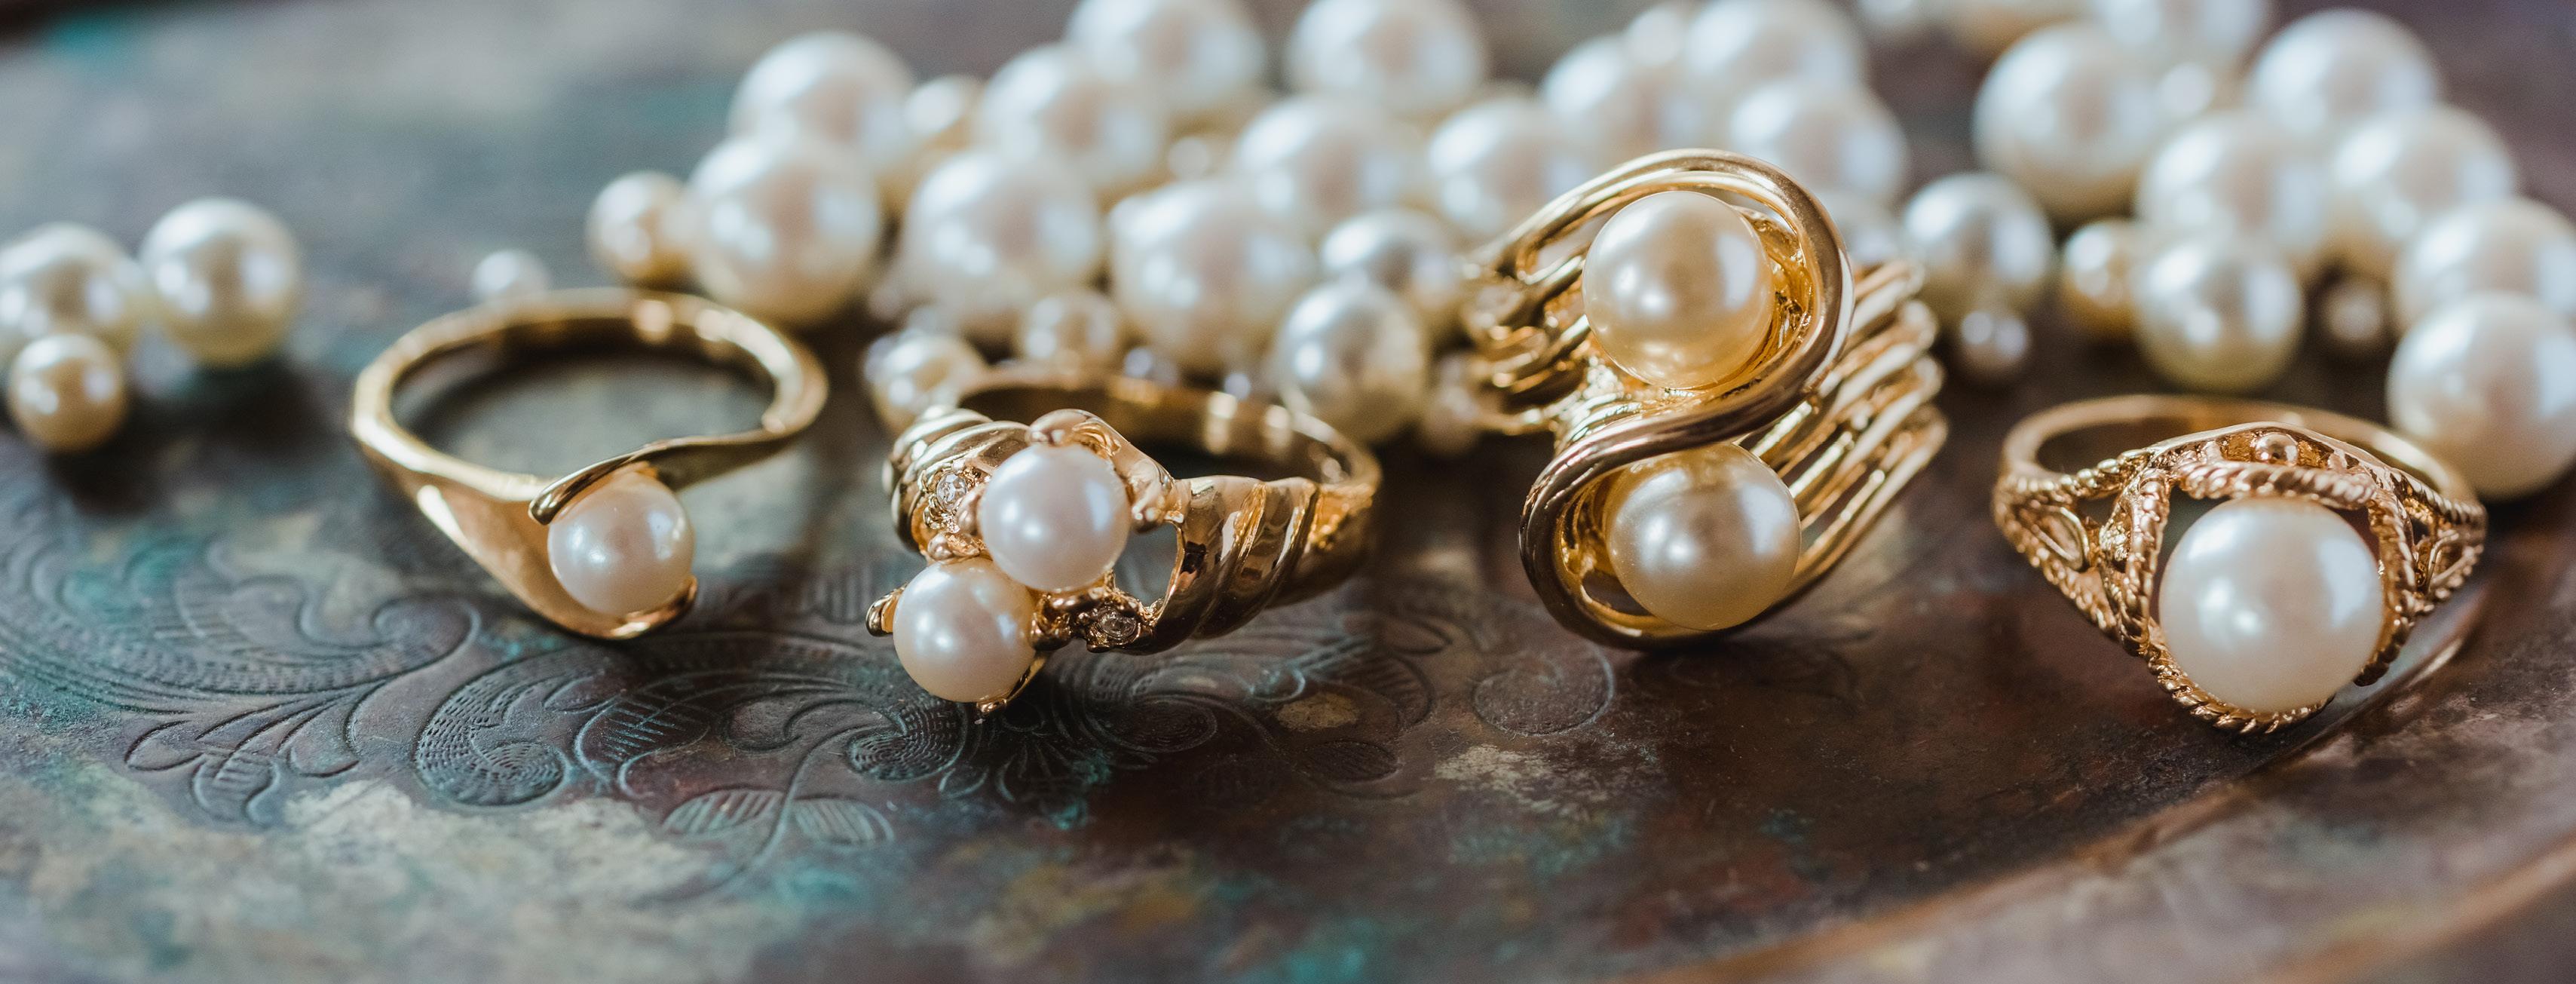 June birthstone vintage pearl ring - cubic zirconia - clear Swarovski crystals